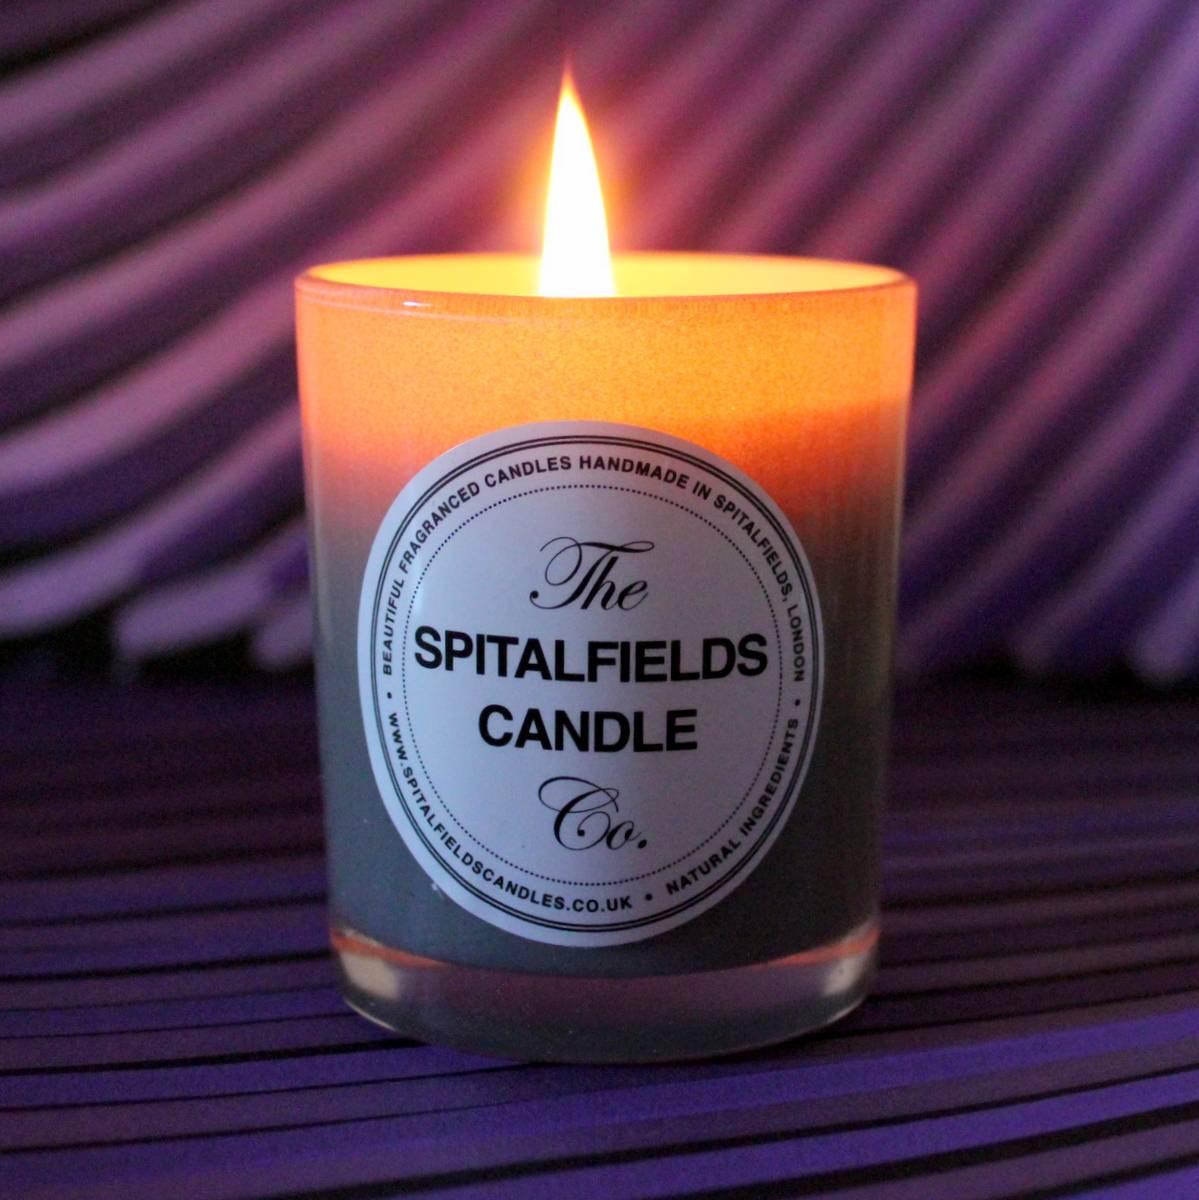 The Spitalfields Candle Company Orange and Clove